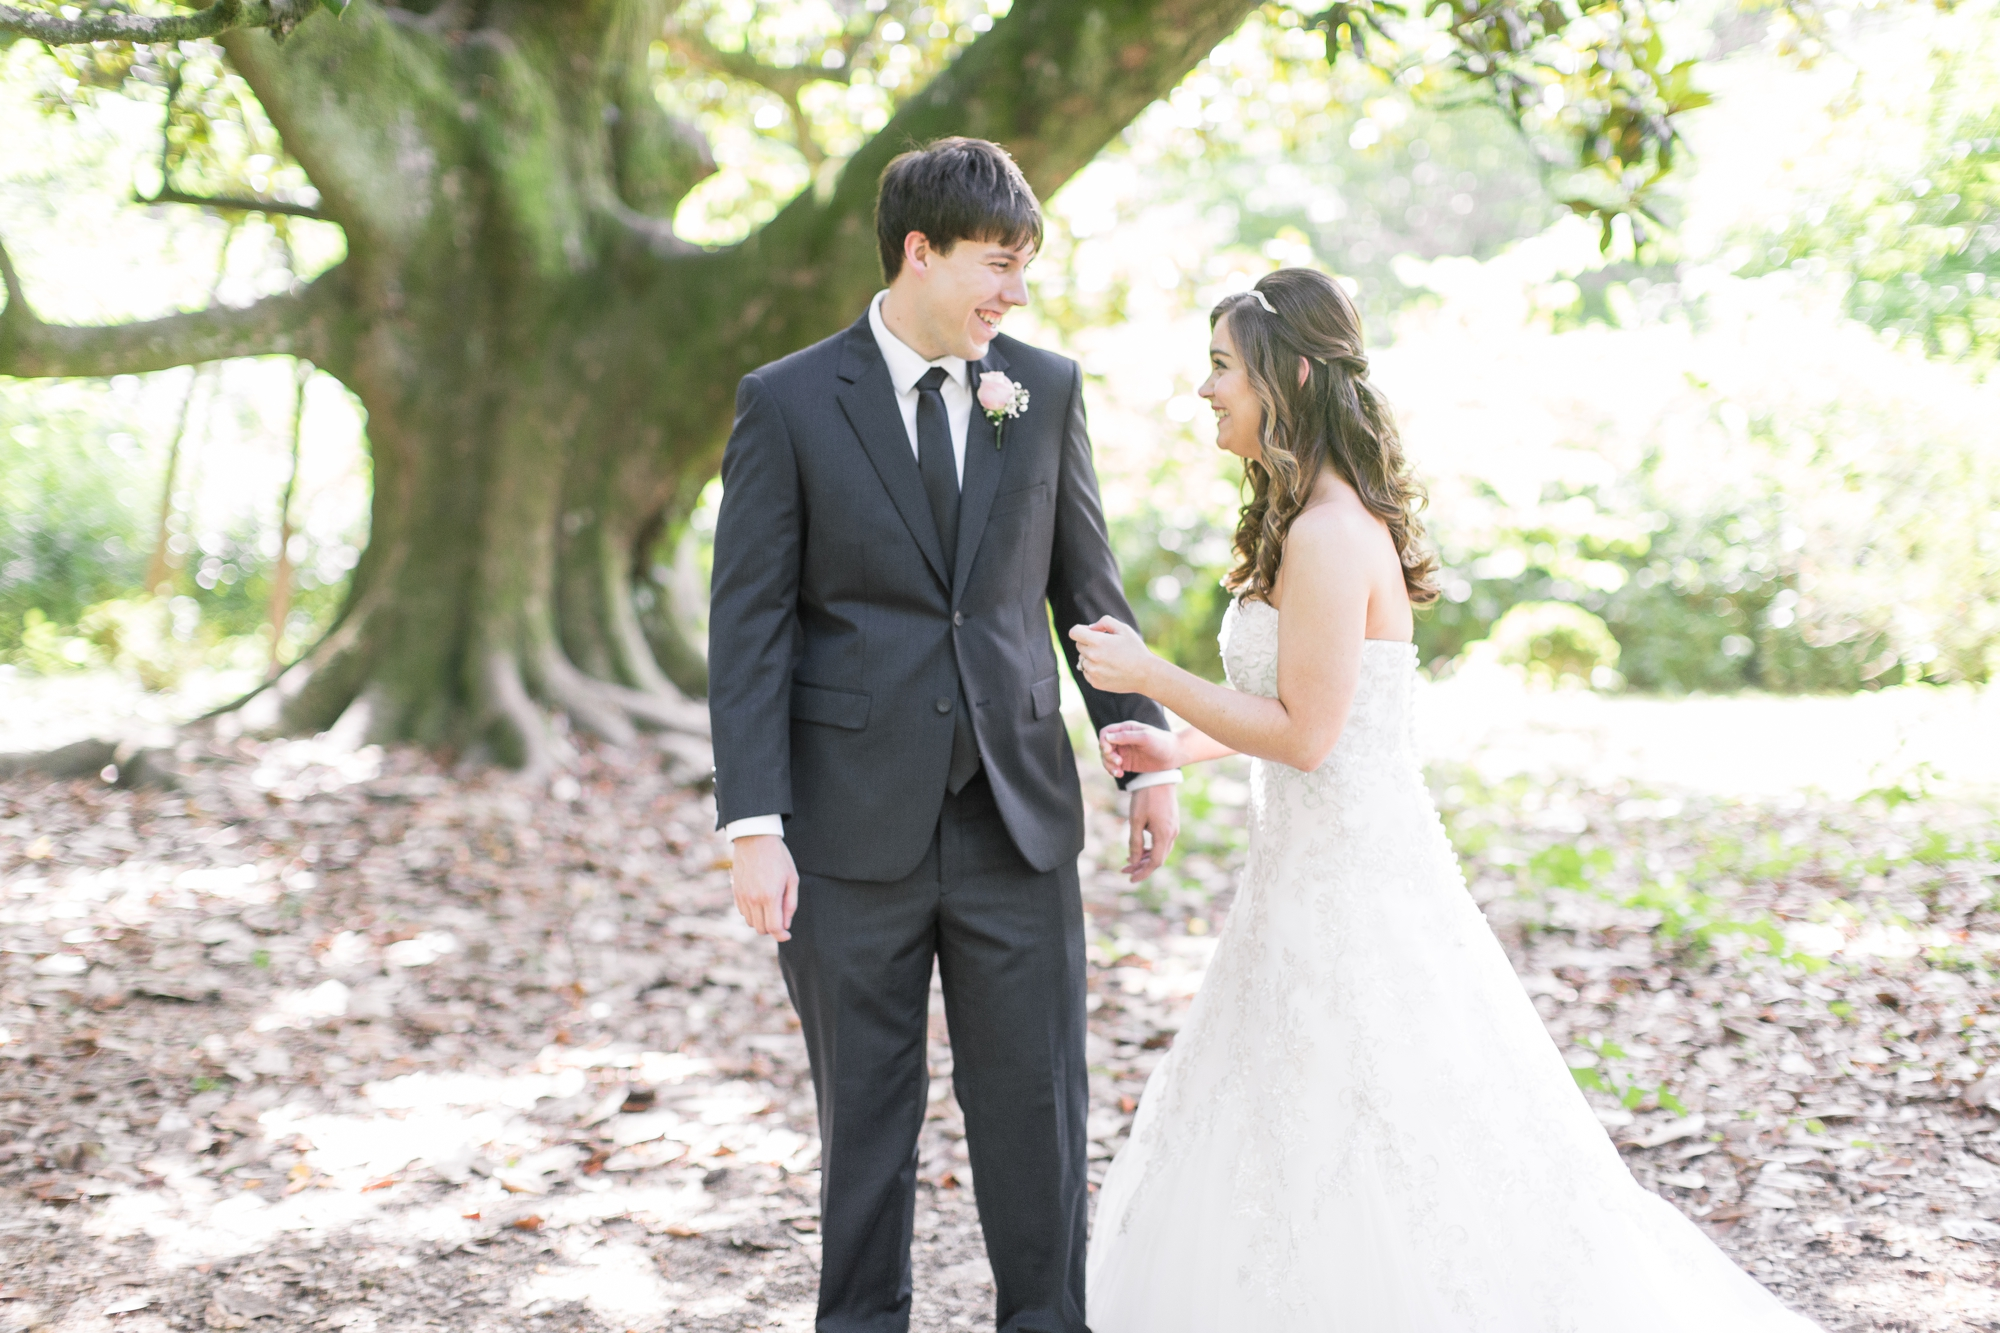 hendersonwedding-99.jpg